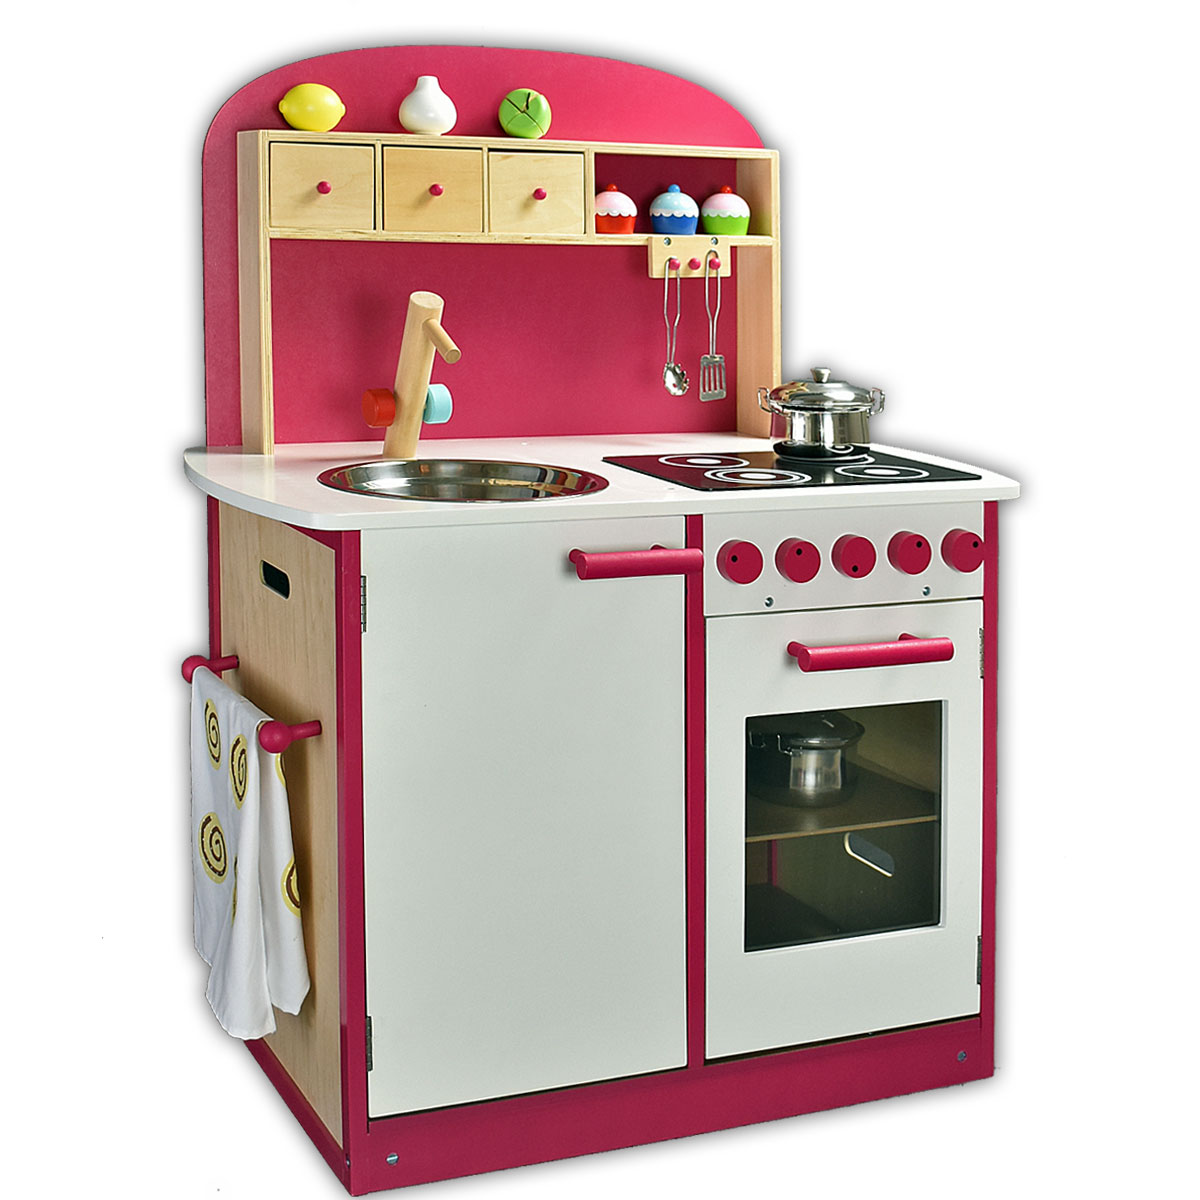 Sun 04124 cucina pink giocattoli di legno per bambini Pirum